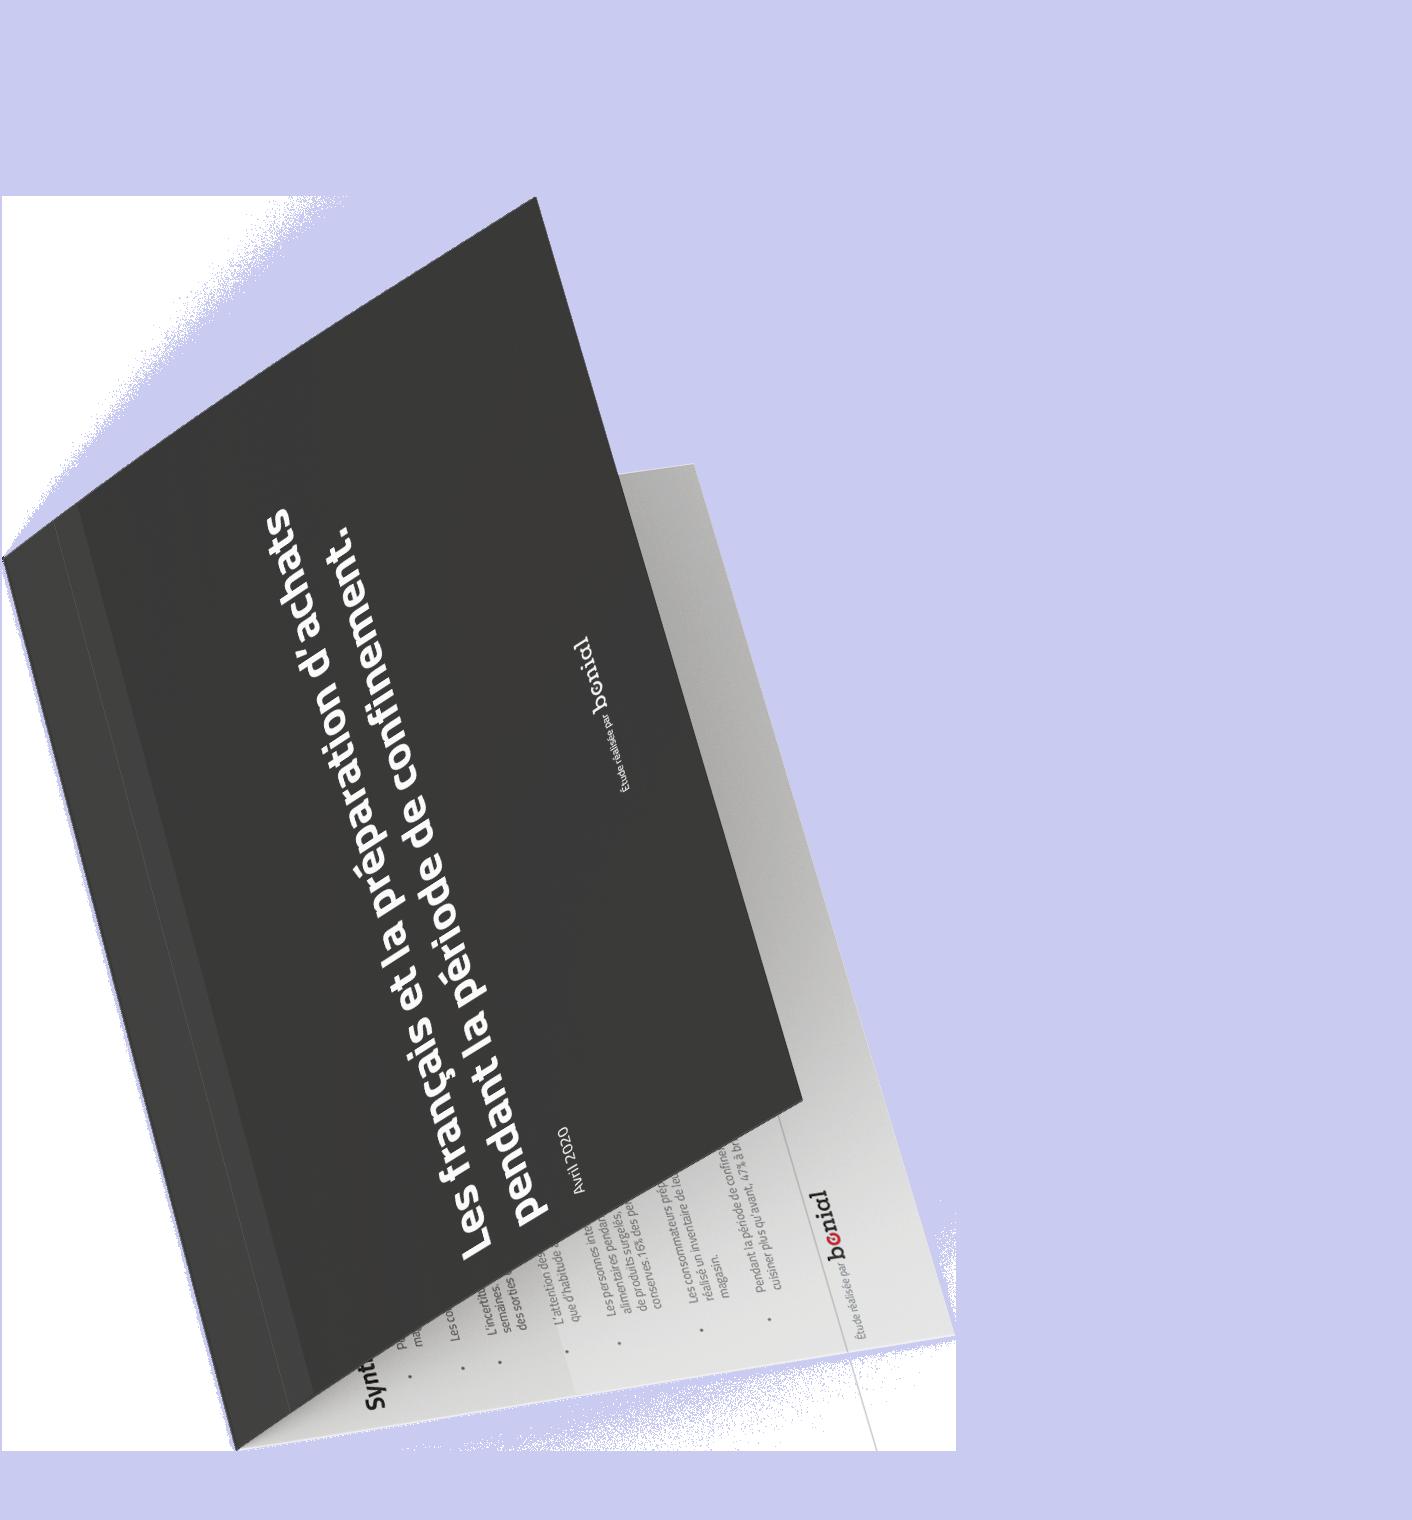 BON-Covid19-Mockup_contenu-200402-D1